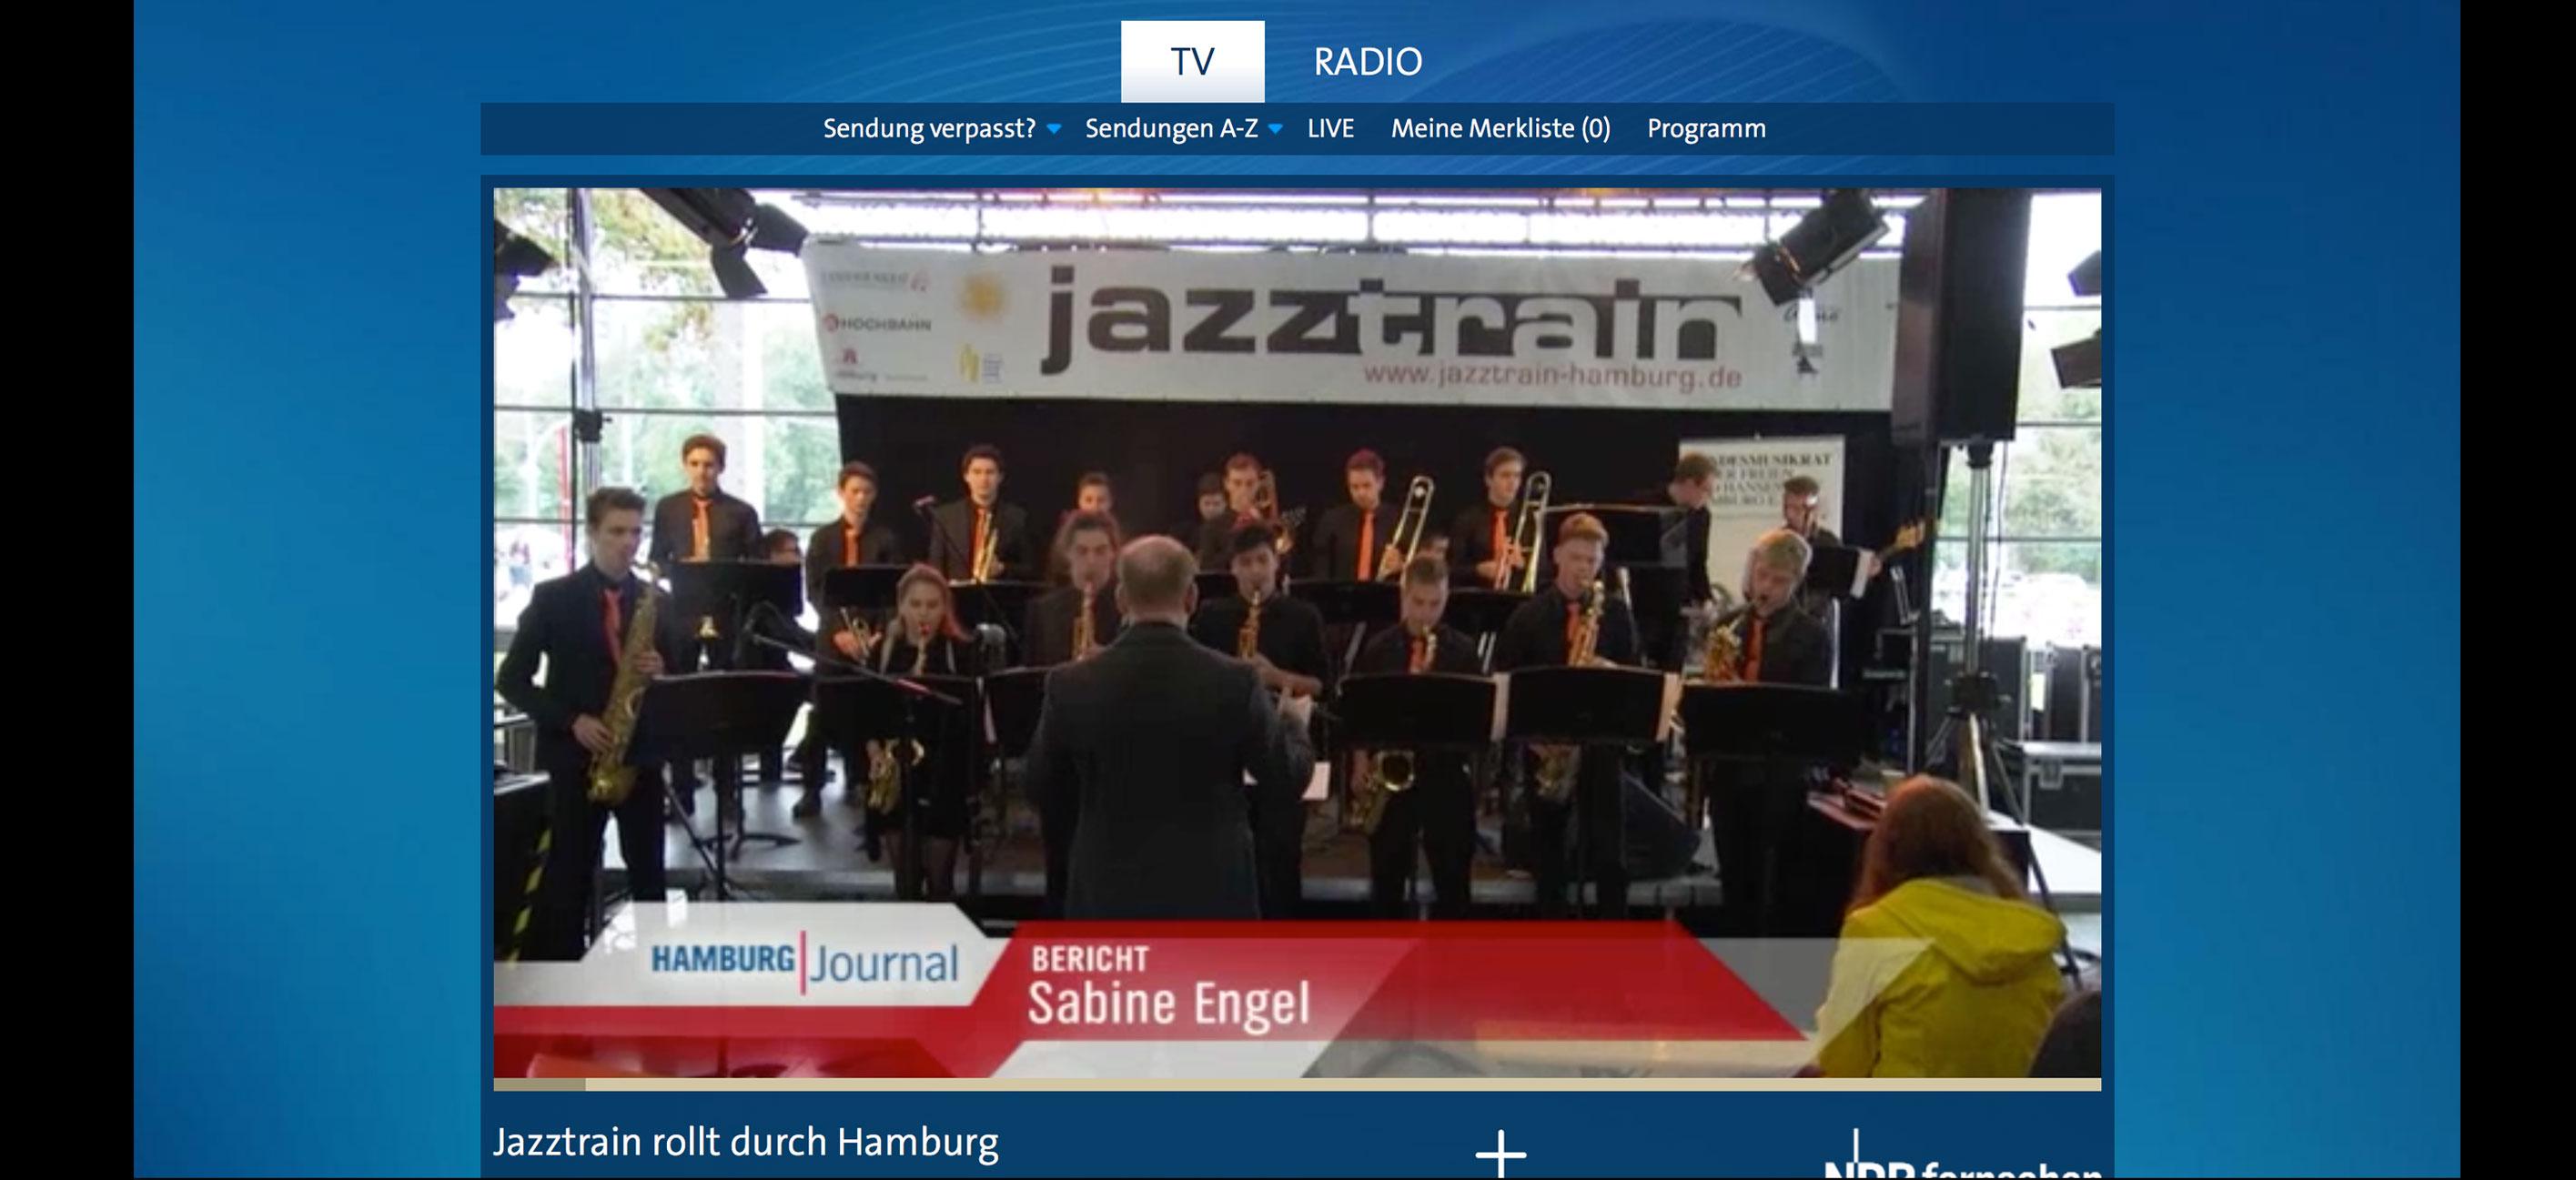 hamburgjournal-jazztrain